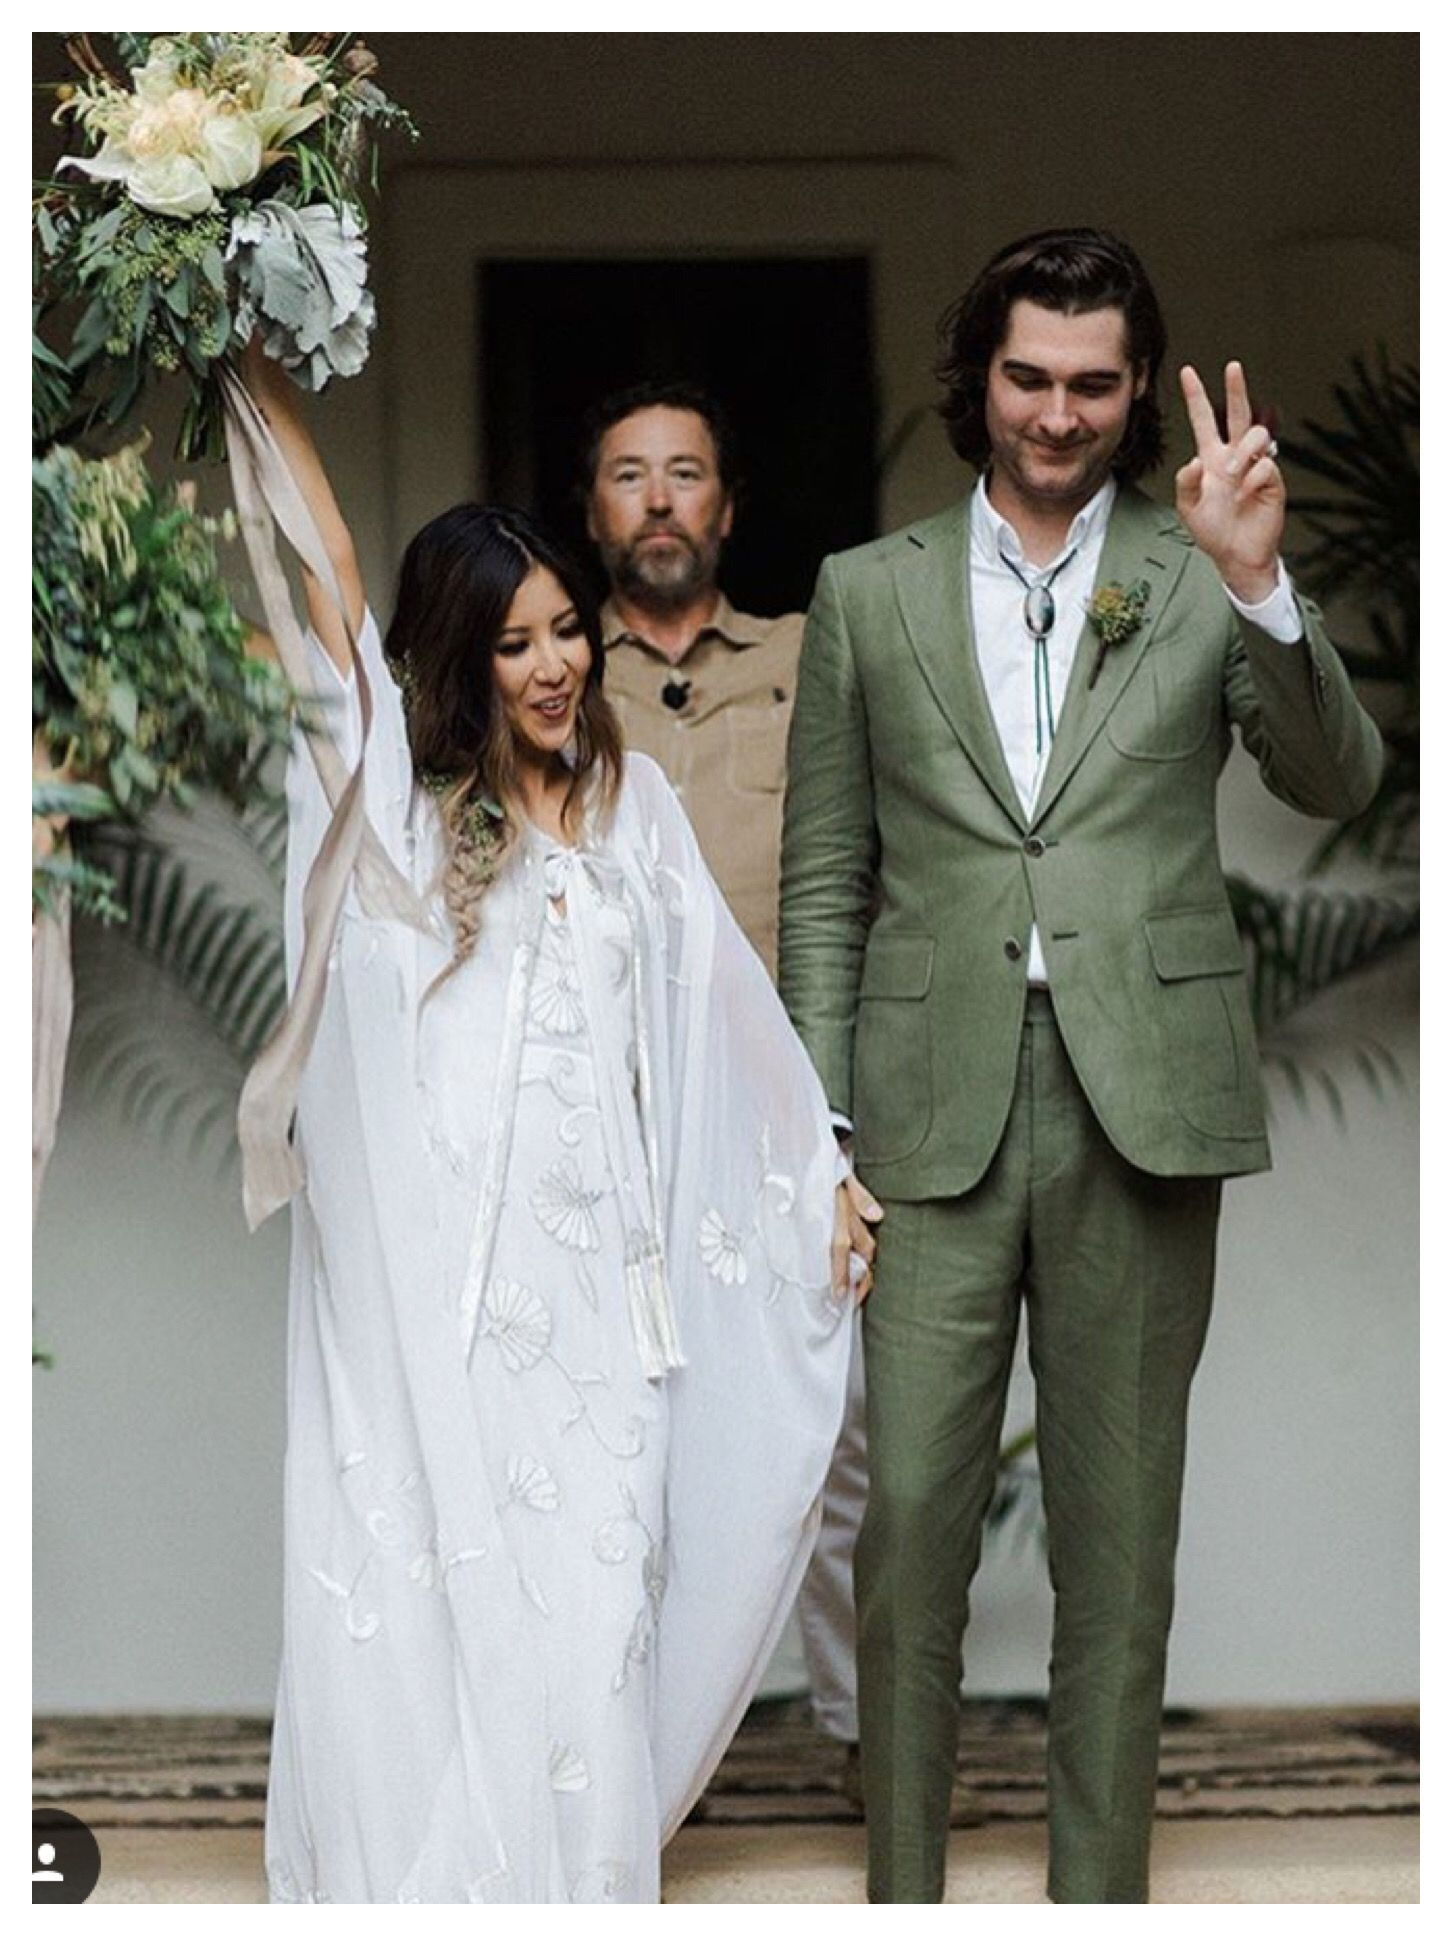 Pin By Megan On R E B E C C A R O B E R T S O N Rebecca Robertson Wedding Wedding Suits Wedding Dresses Lace